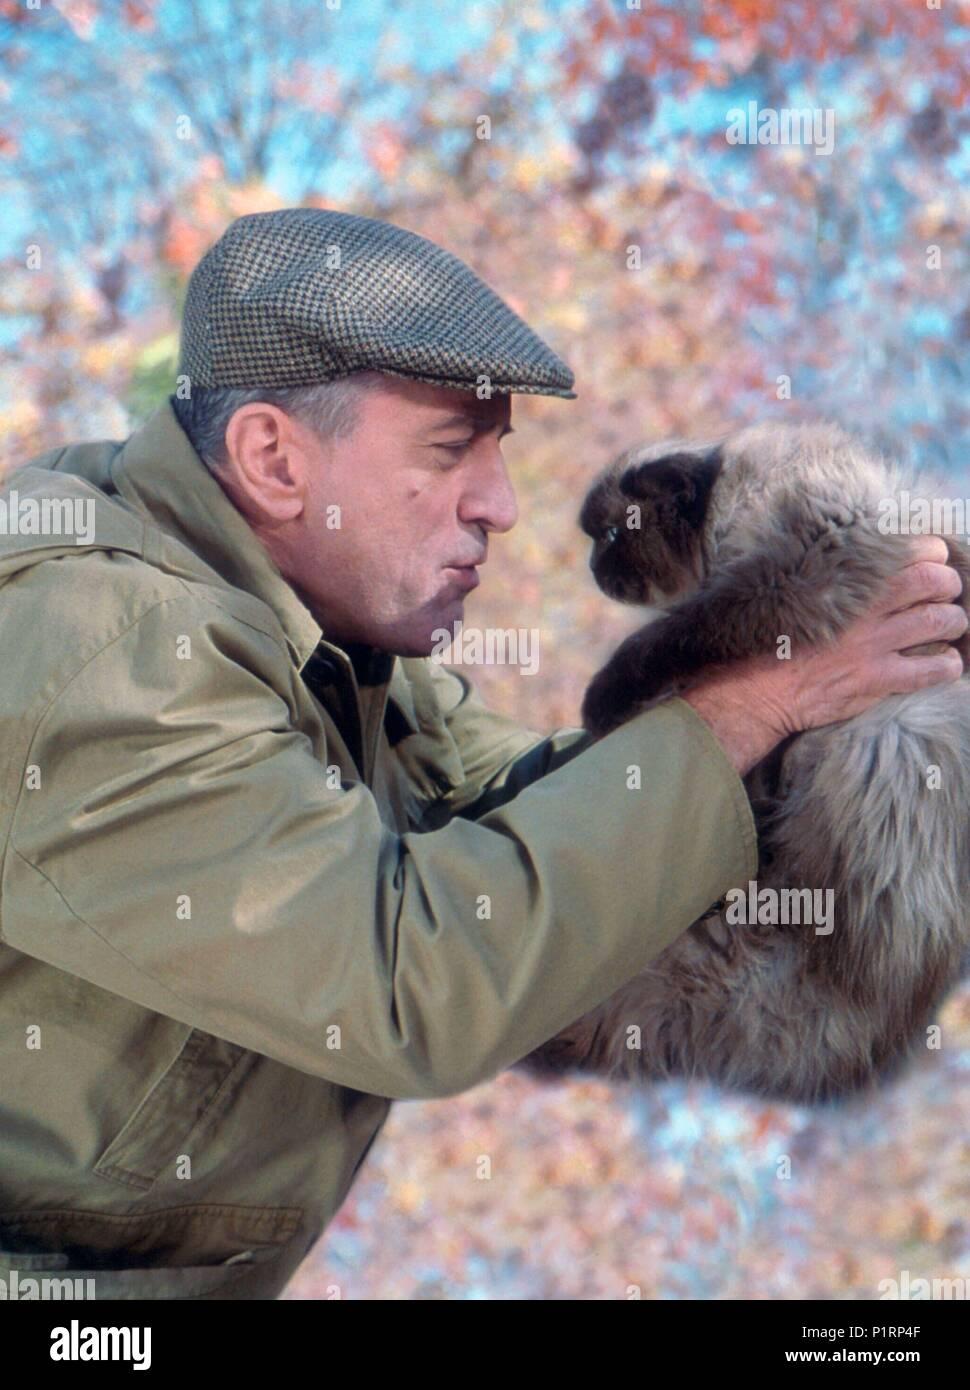 Original Film Title: MEET THE PARENTS.  English Title: MEET THE PARENTS.  Film Director: M. JAY ROACH.  Year: 2000.  Stars: ROBERT DE NIRO. Credit: UNIVERSAL / Album - Stock Image